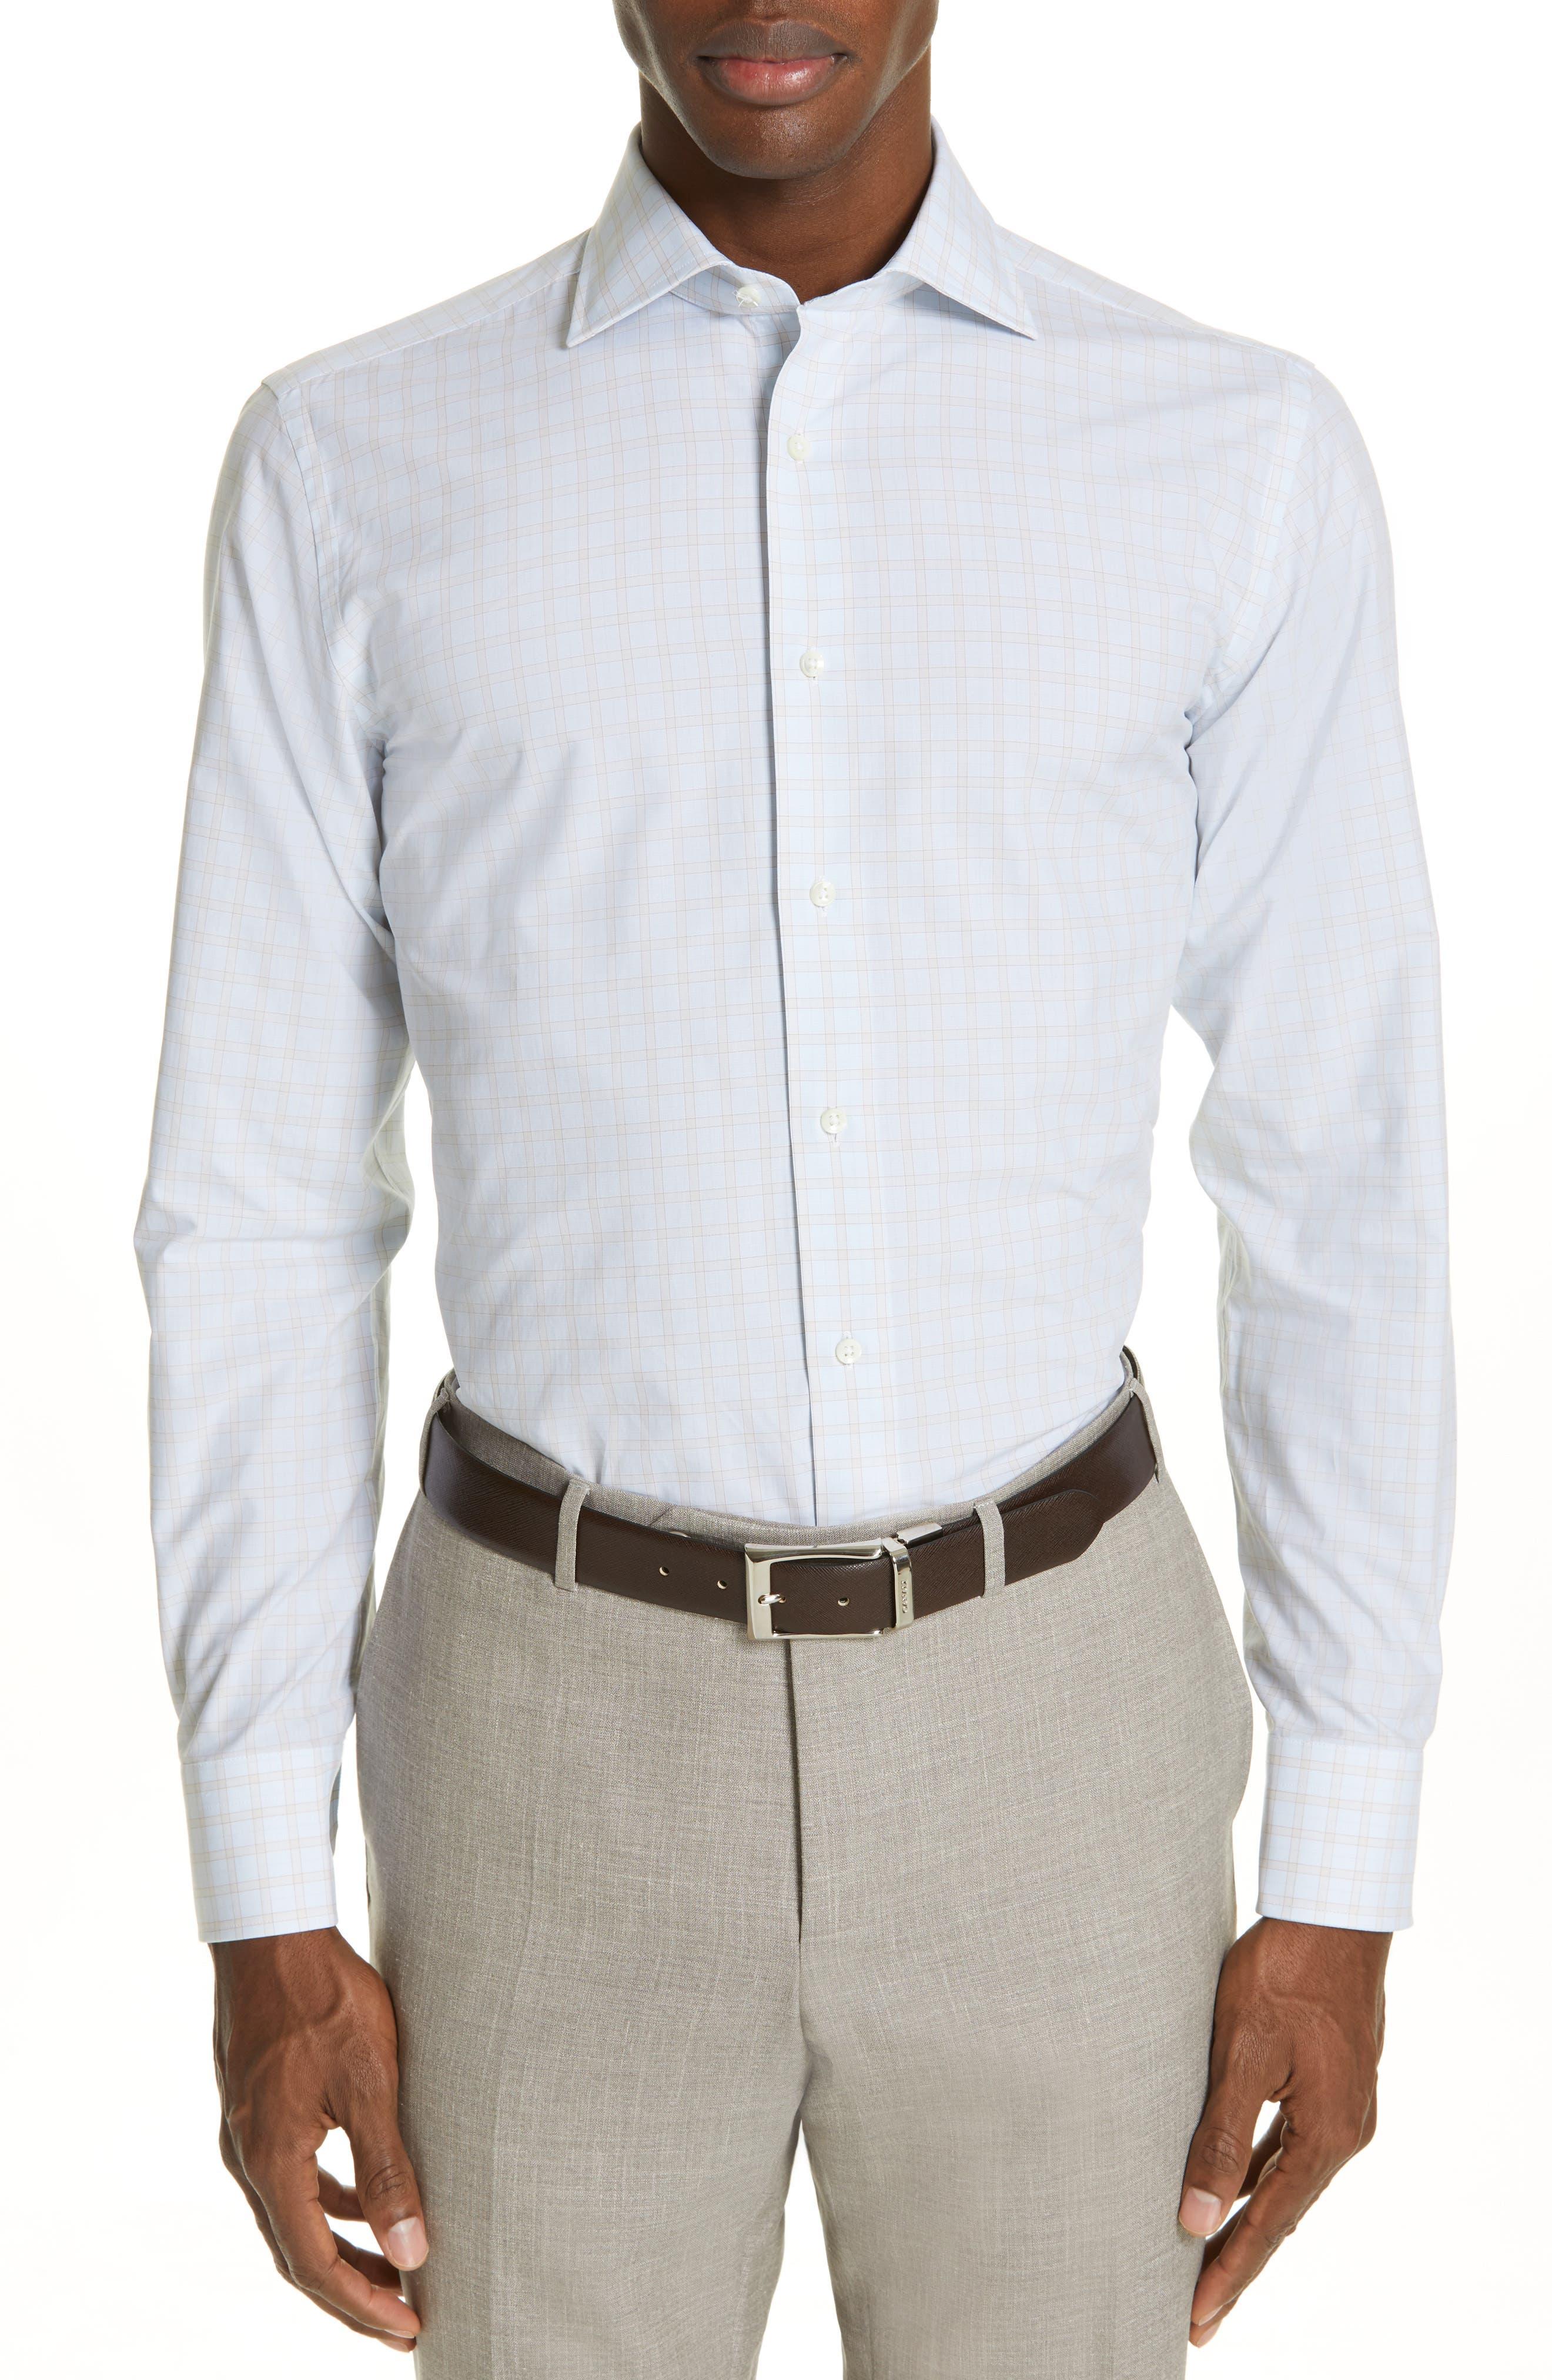 CANALI, Regular Fit Plaid Dress Shirt, Main thumbnail 1, color, BEIGE